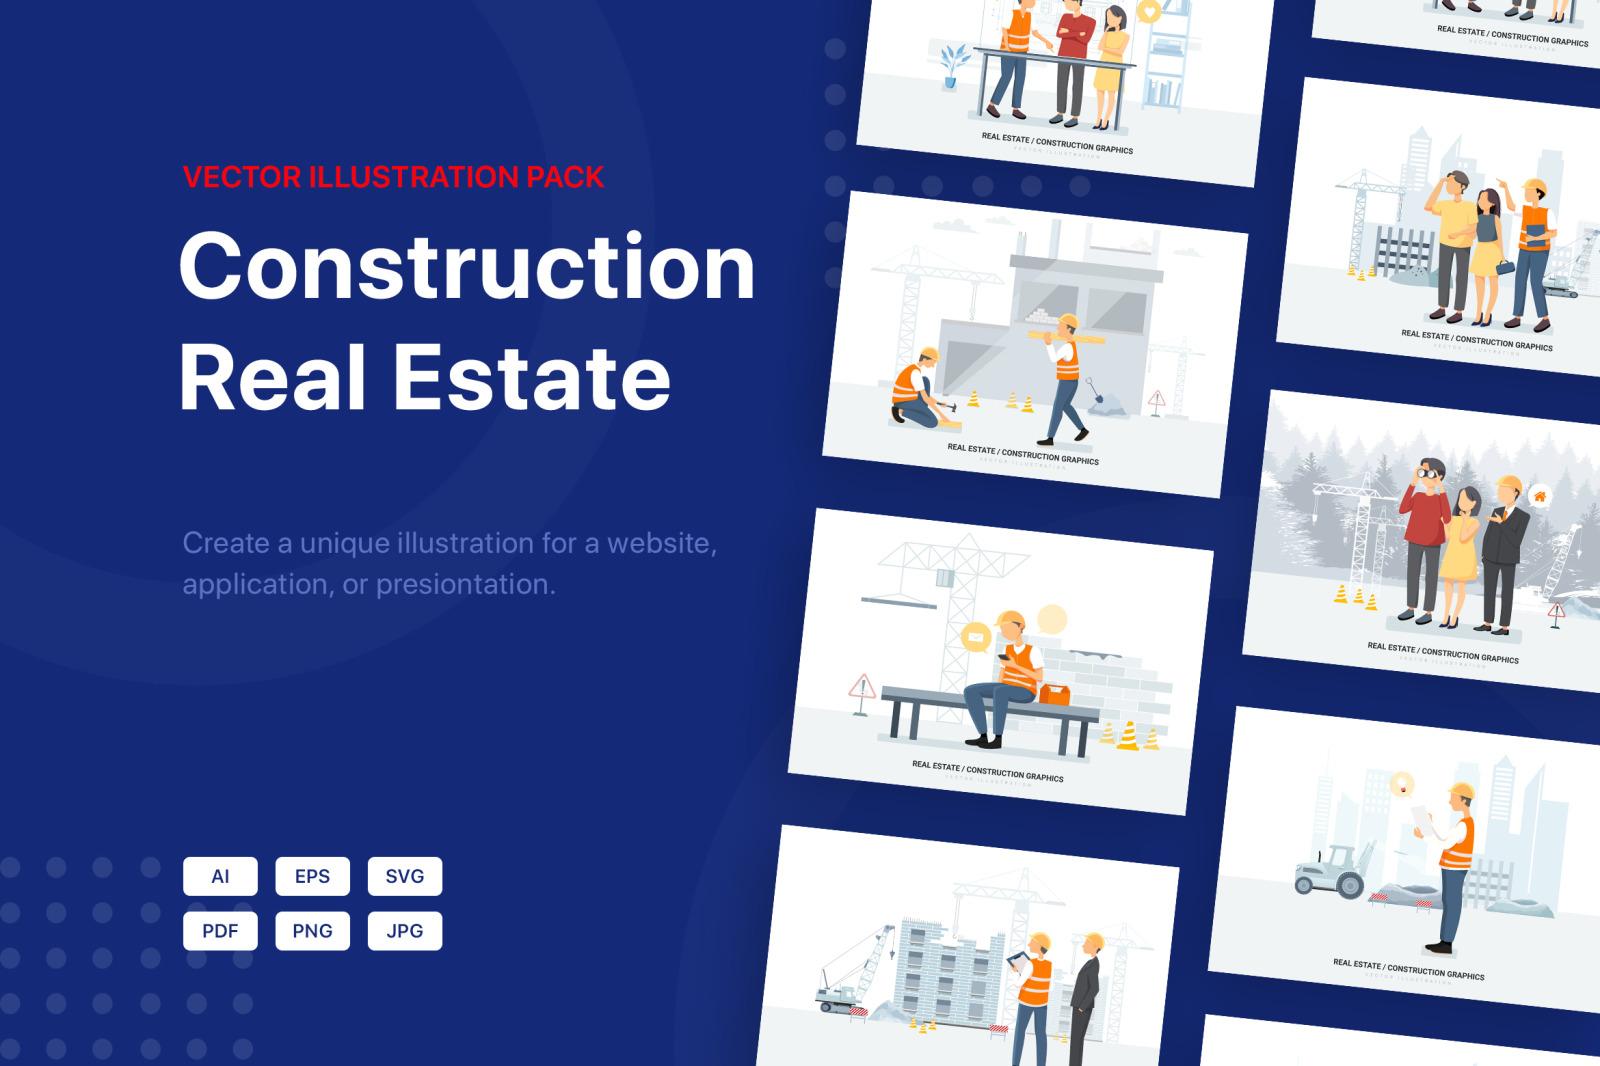 Construction & Real Estate Vector Illustration